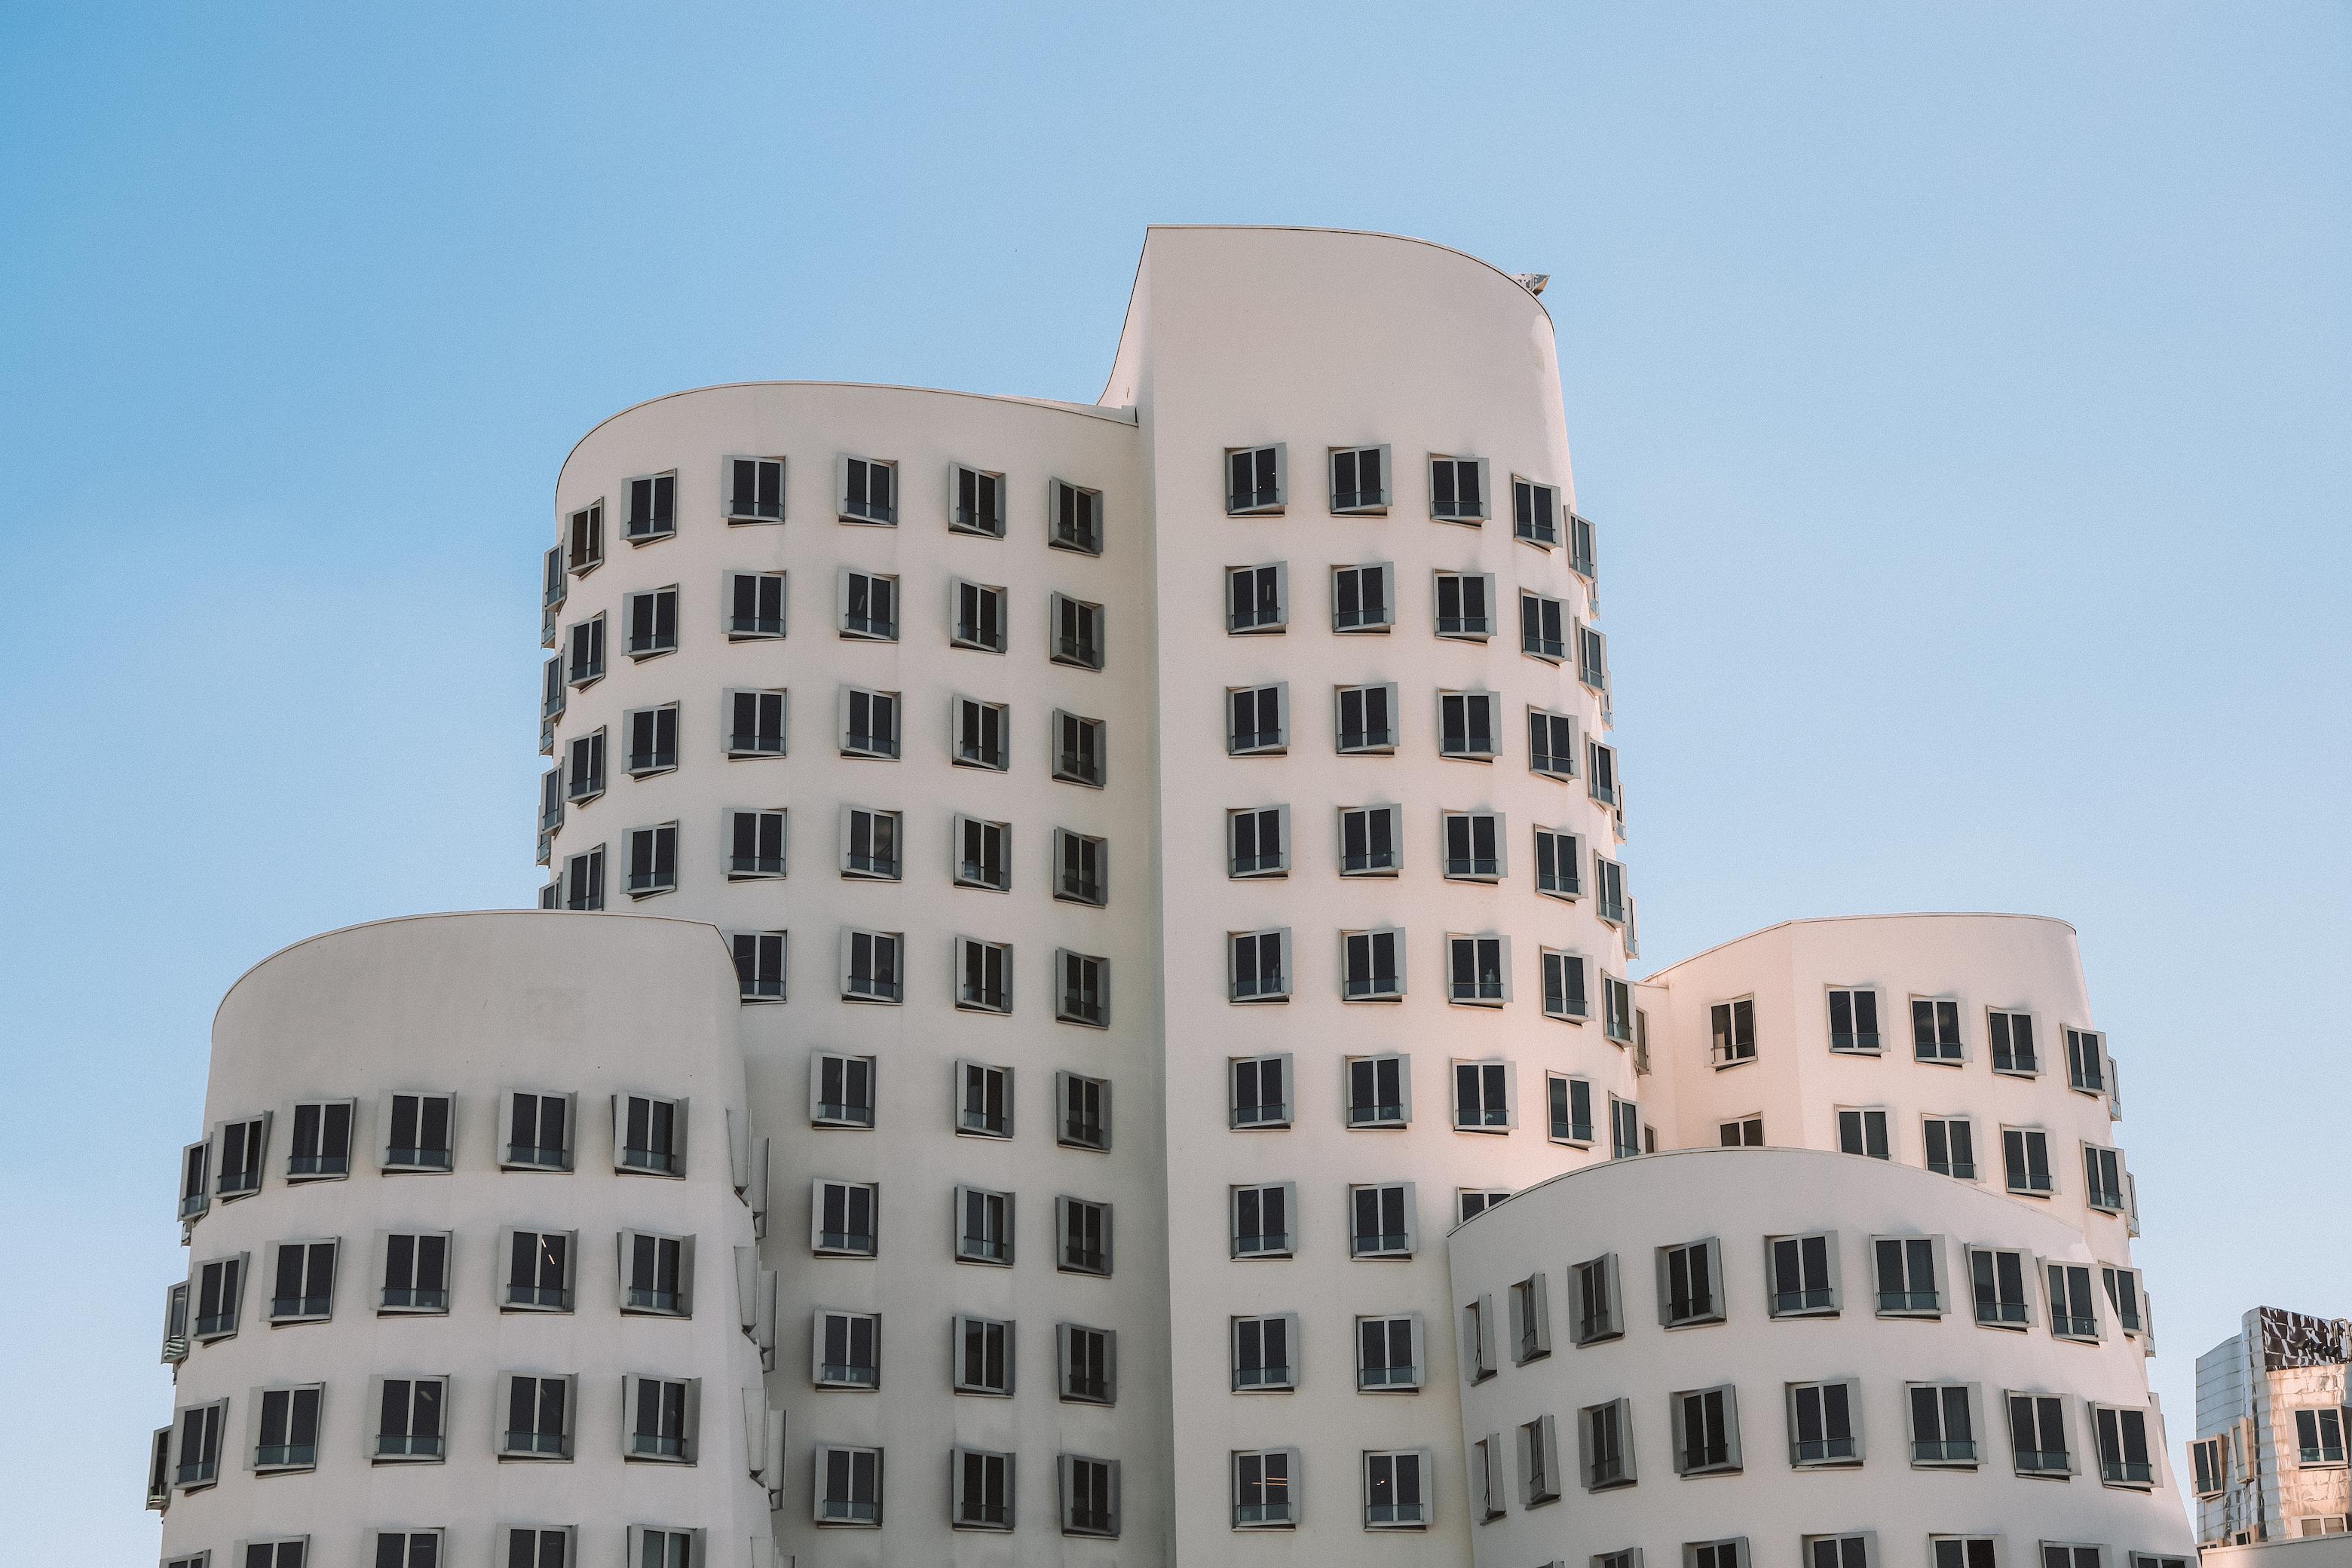 fotografie in Dusseldorf